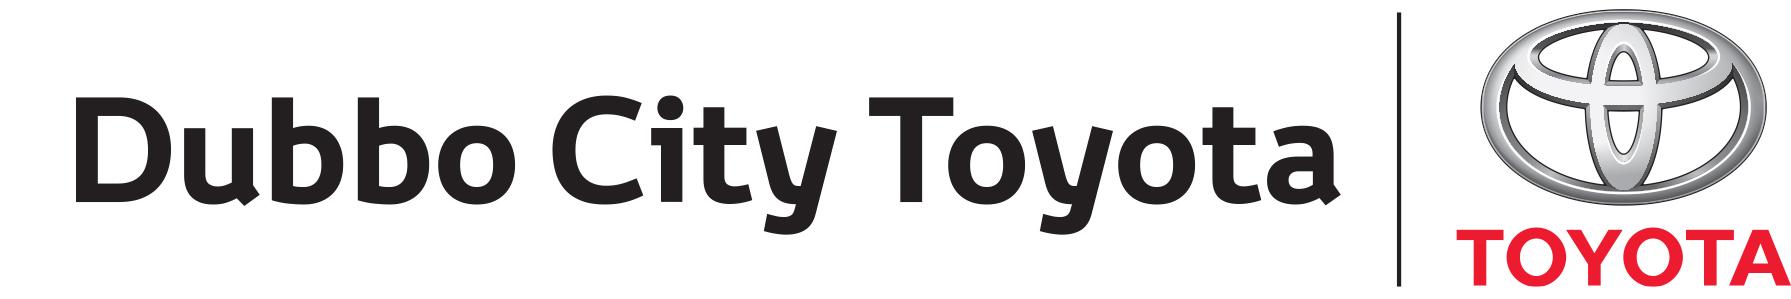 Dubbo City Toyota Logo.jpg